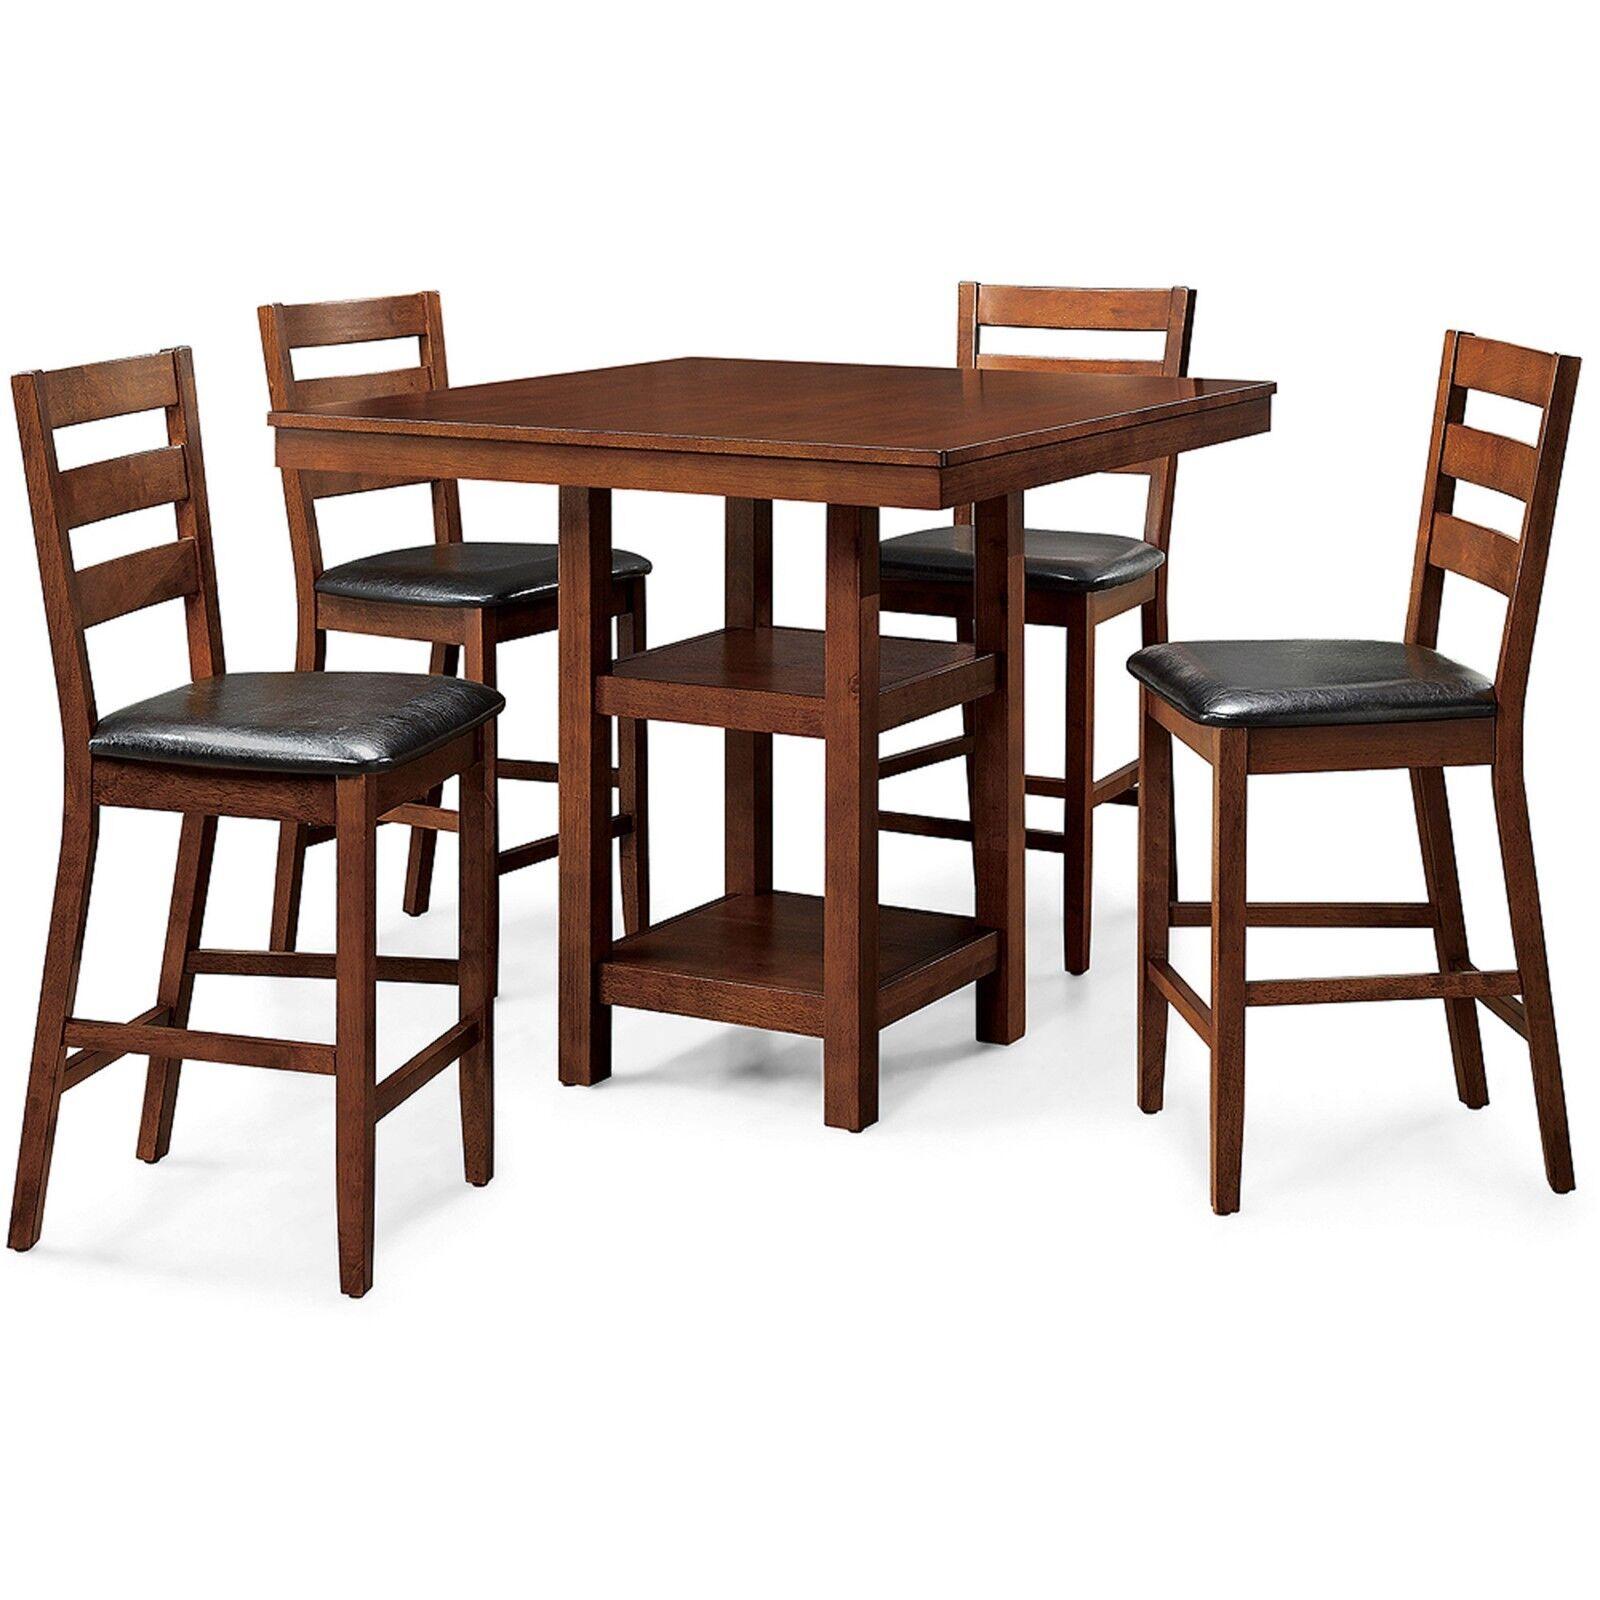 Roundhill Furniture Biony 5 Piece